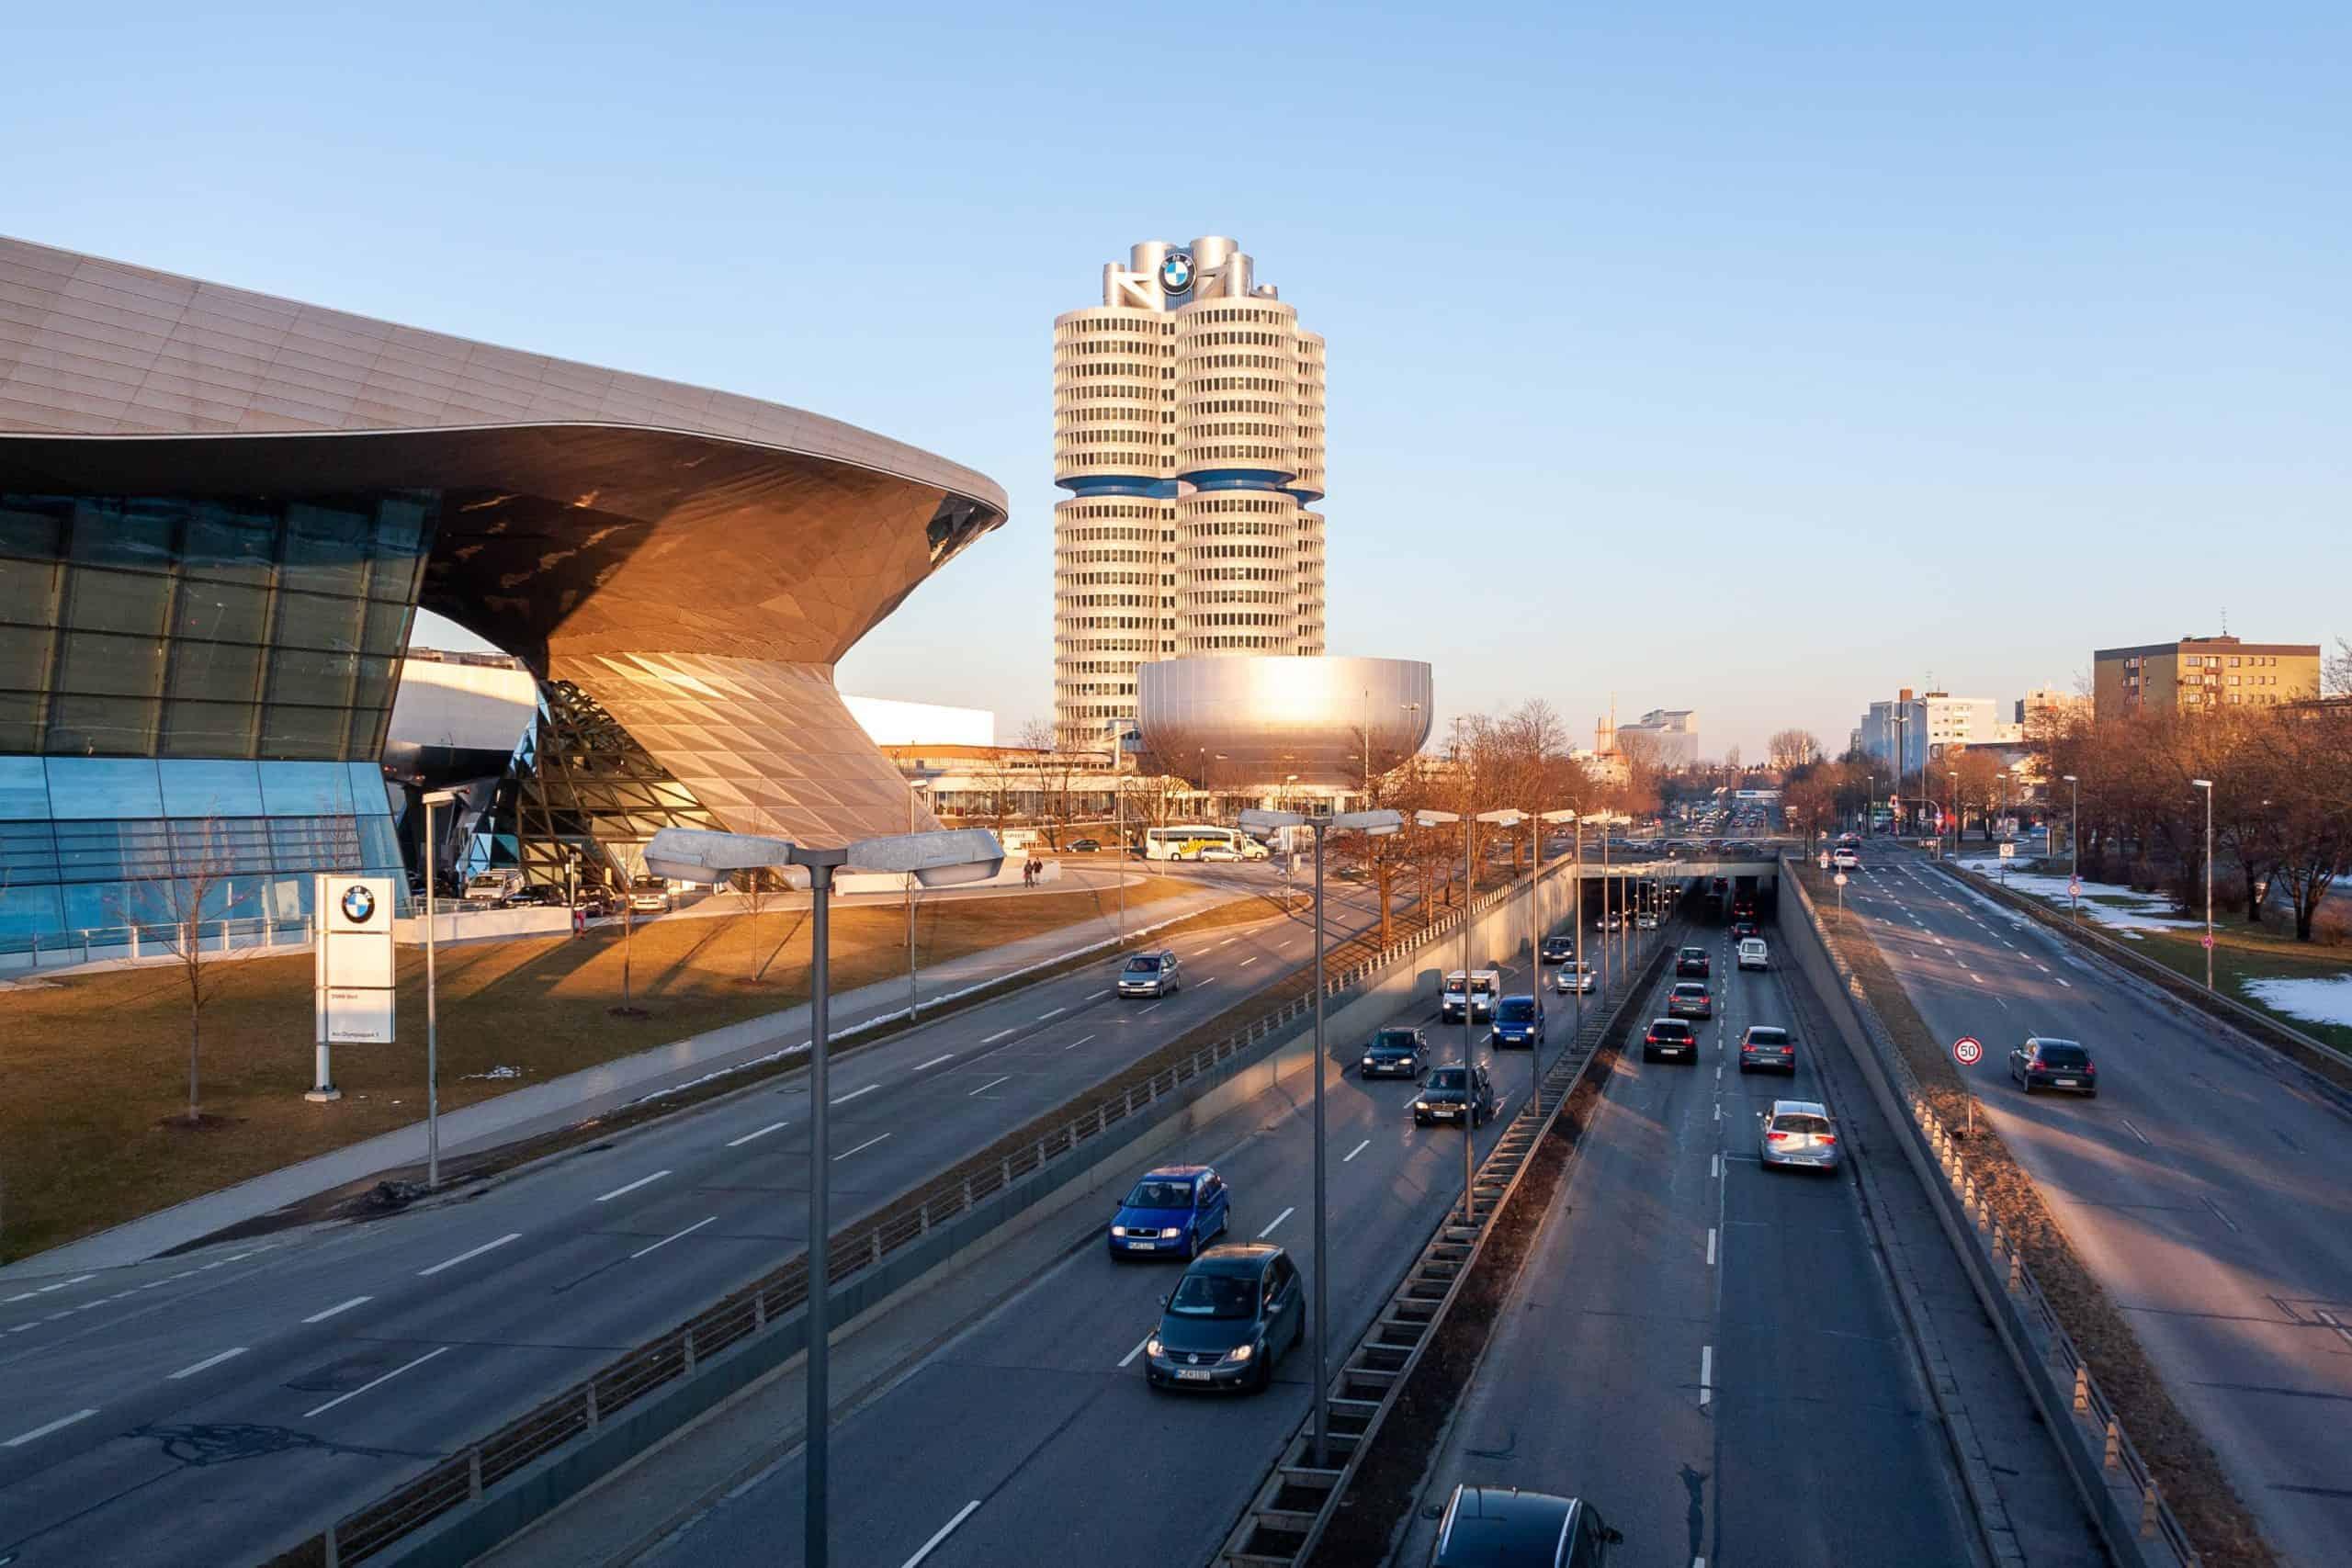 BRUNATA-METRONA aus München verstärkt Proptech1 Ventures